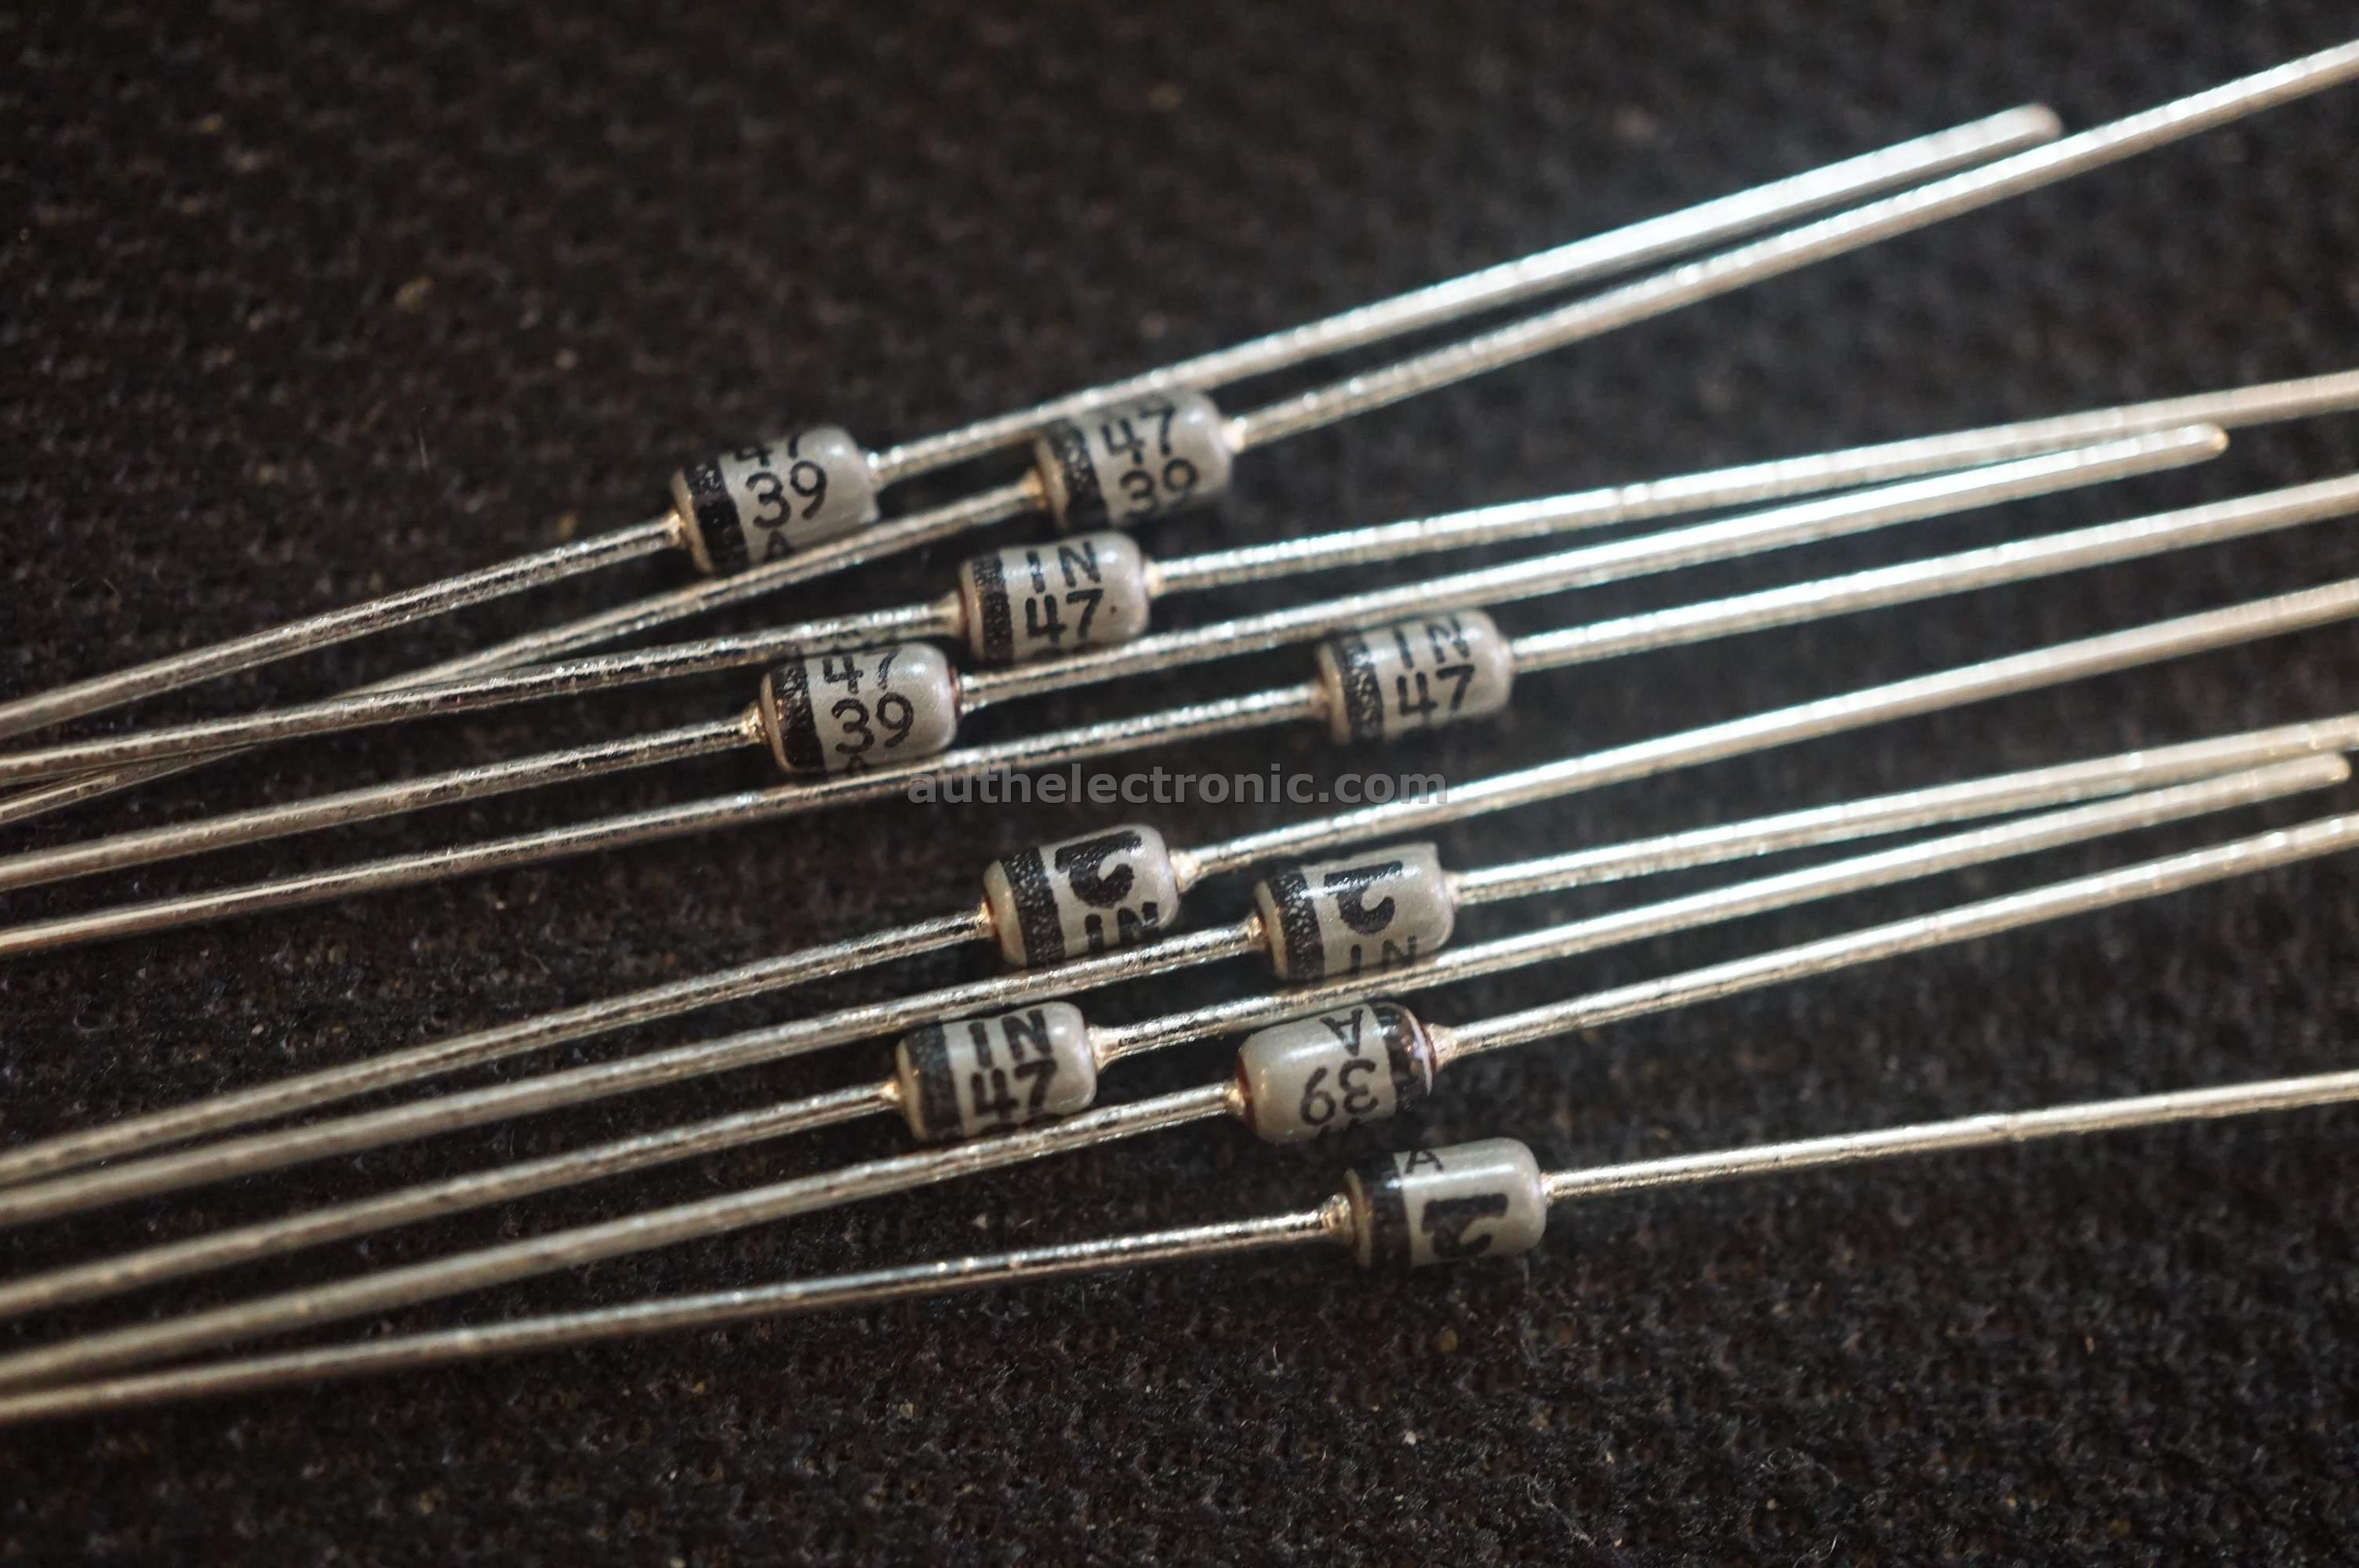 original-10-pcs-zener-diode-1n4739-4739-9-1v-1-3w-new-vishay